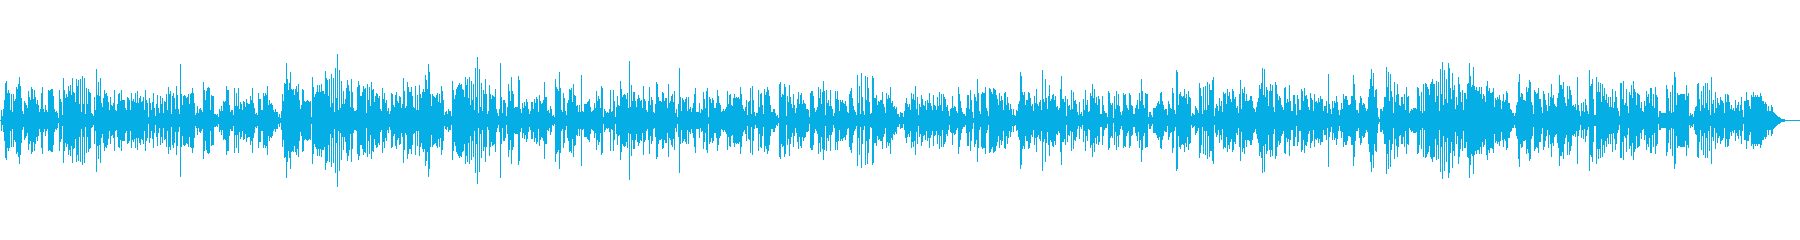 JAZZ|お洒落★高級感を演出|ピアノ の再生済みの波形